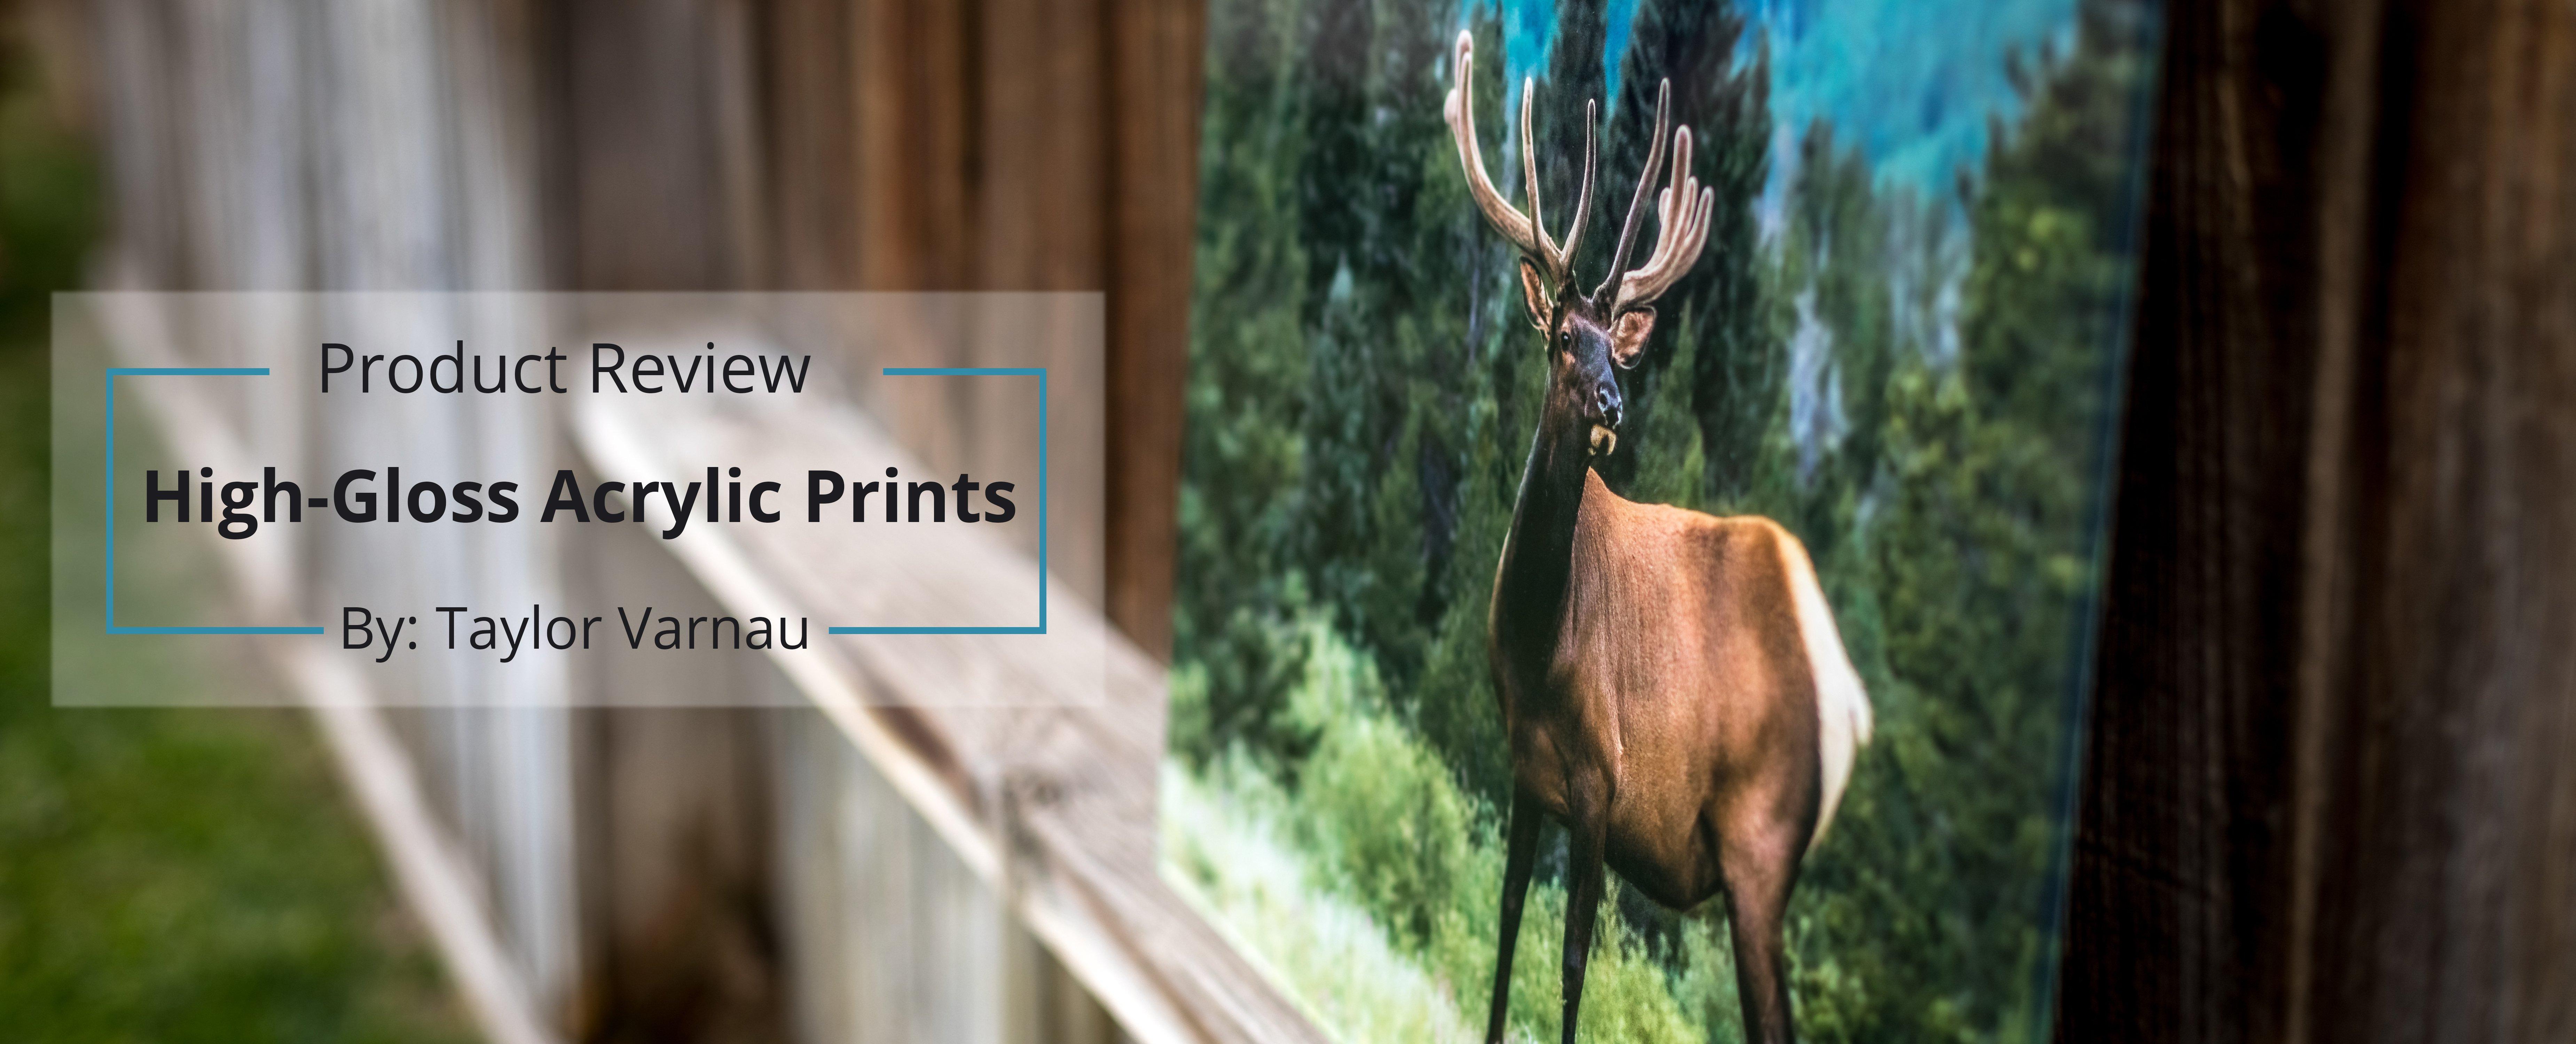 acrylic-cgproprints-review-taylor-varnau